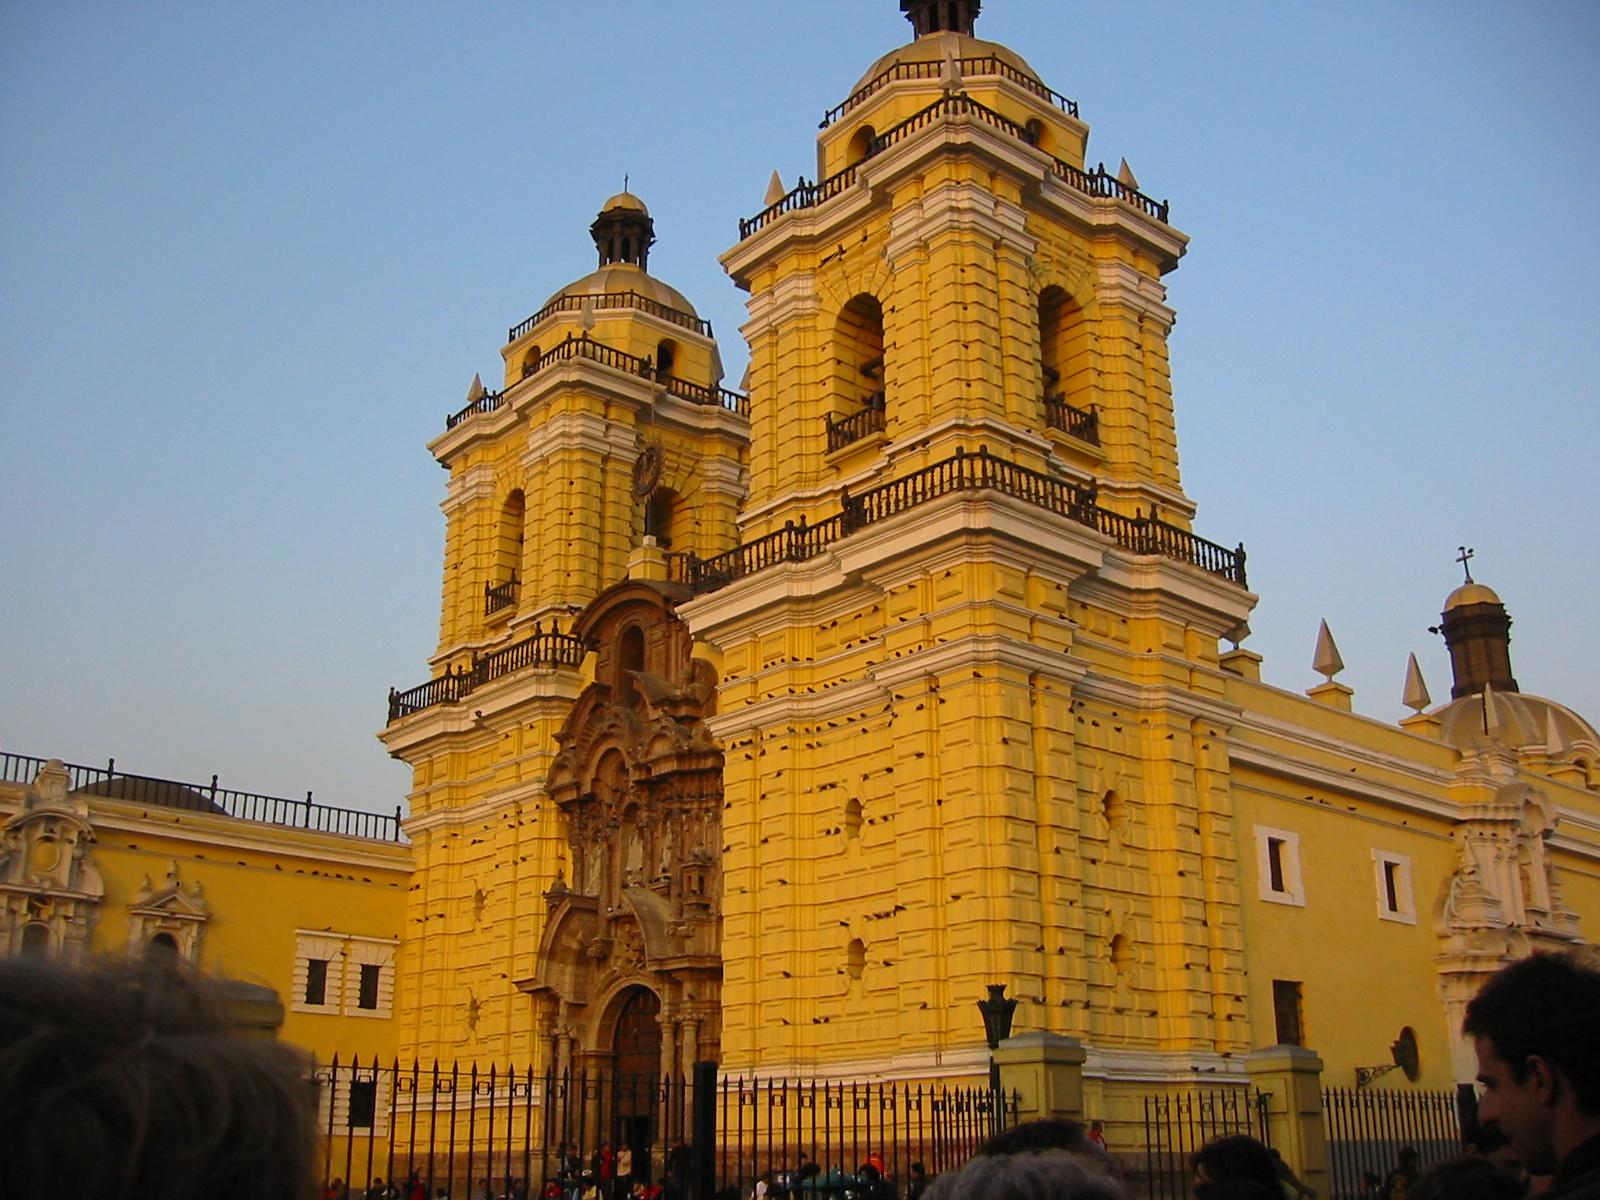 San fracisco monastery Lima,Peru